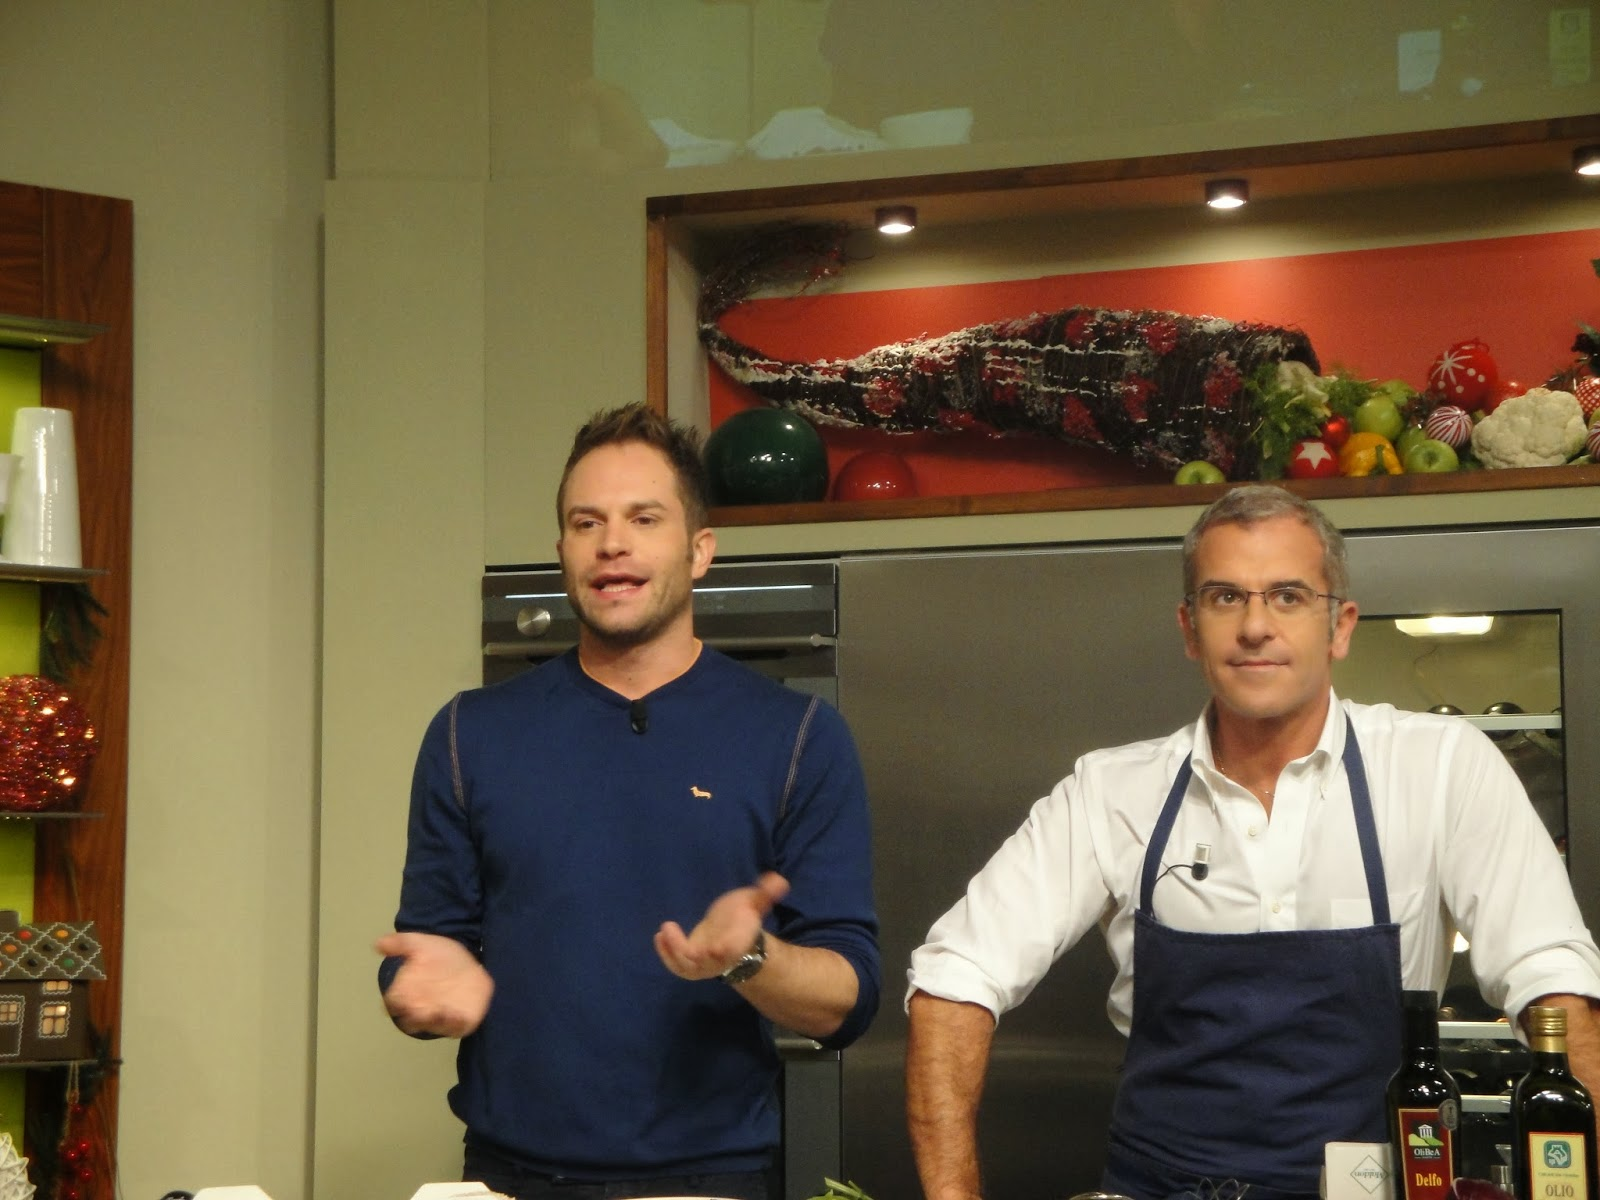 Ricette di max cucina l'italia